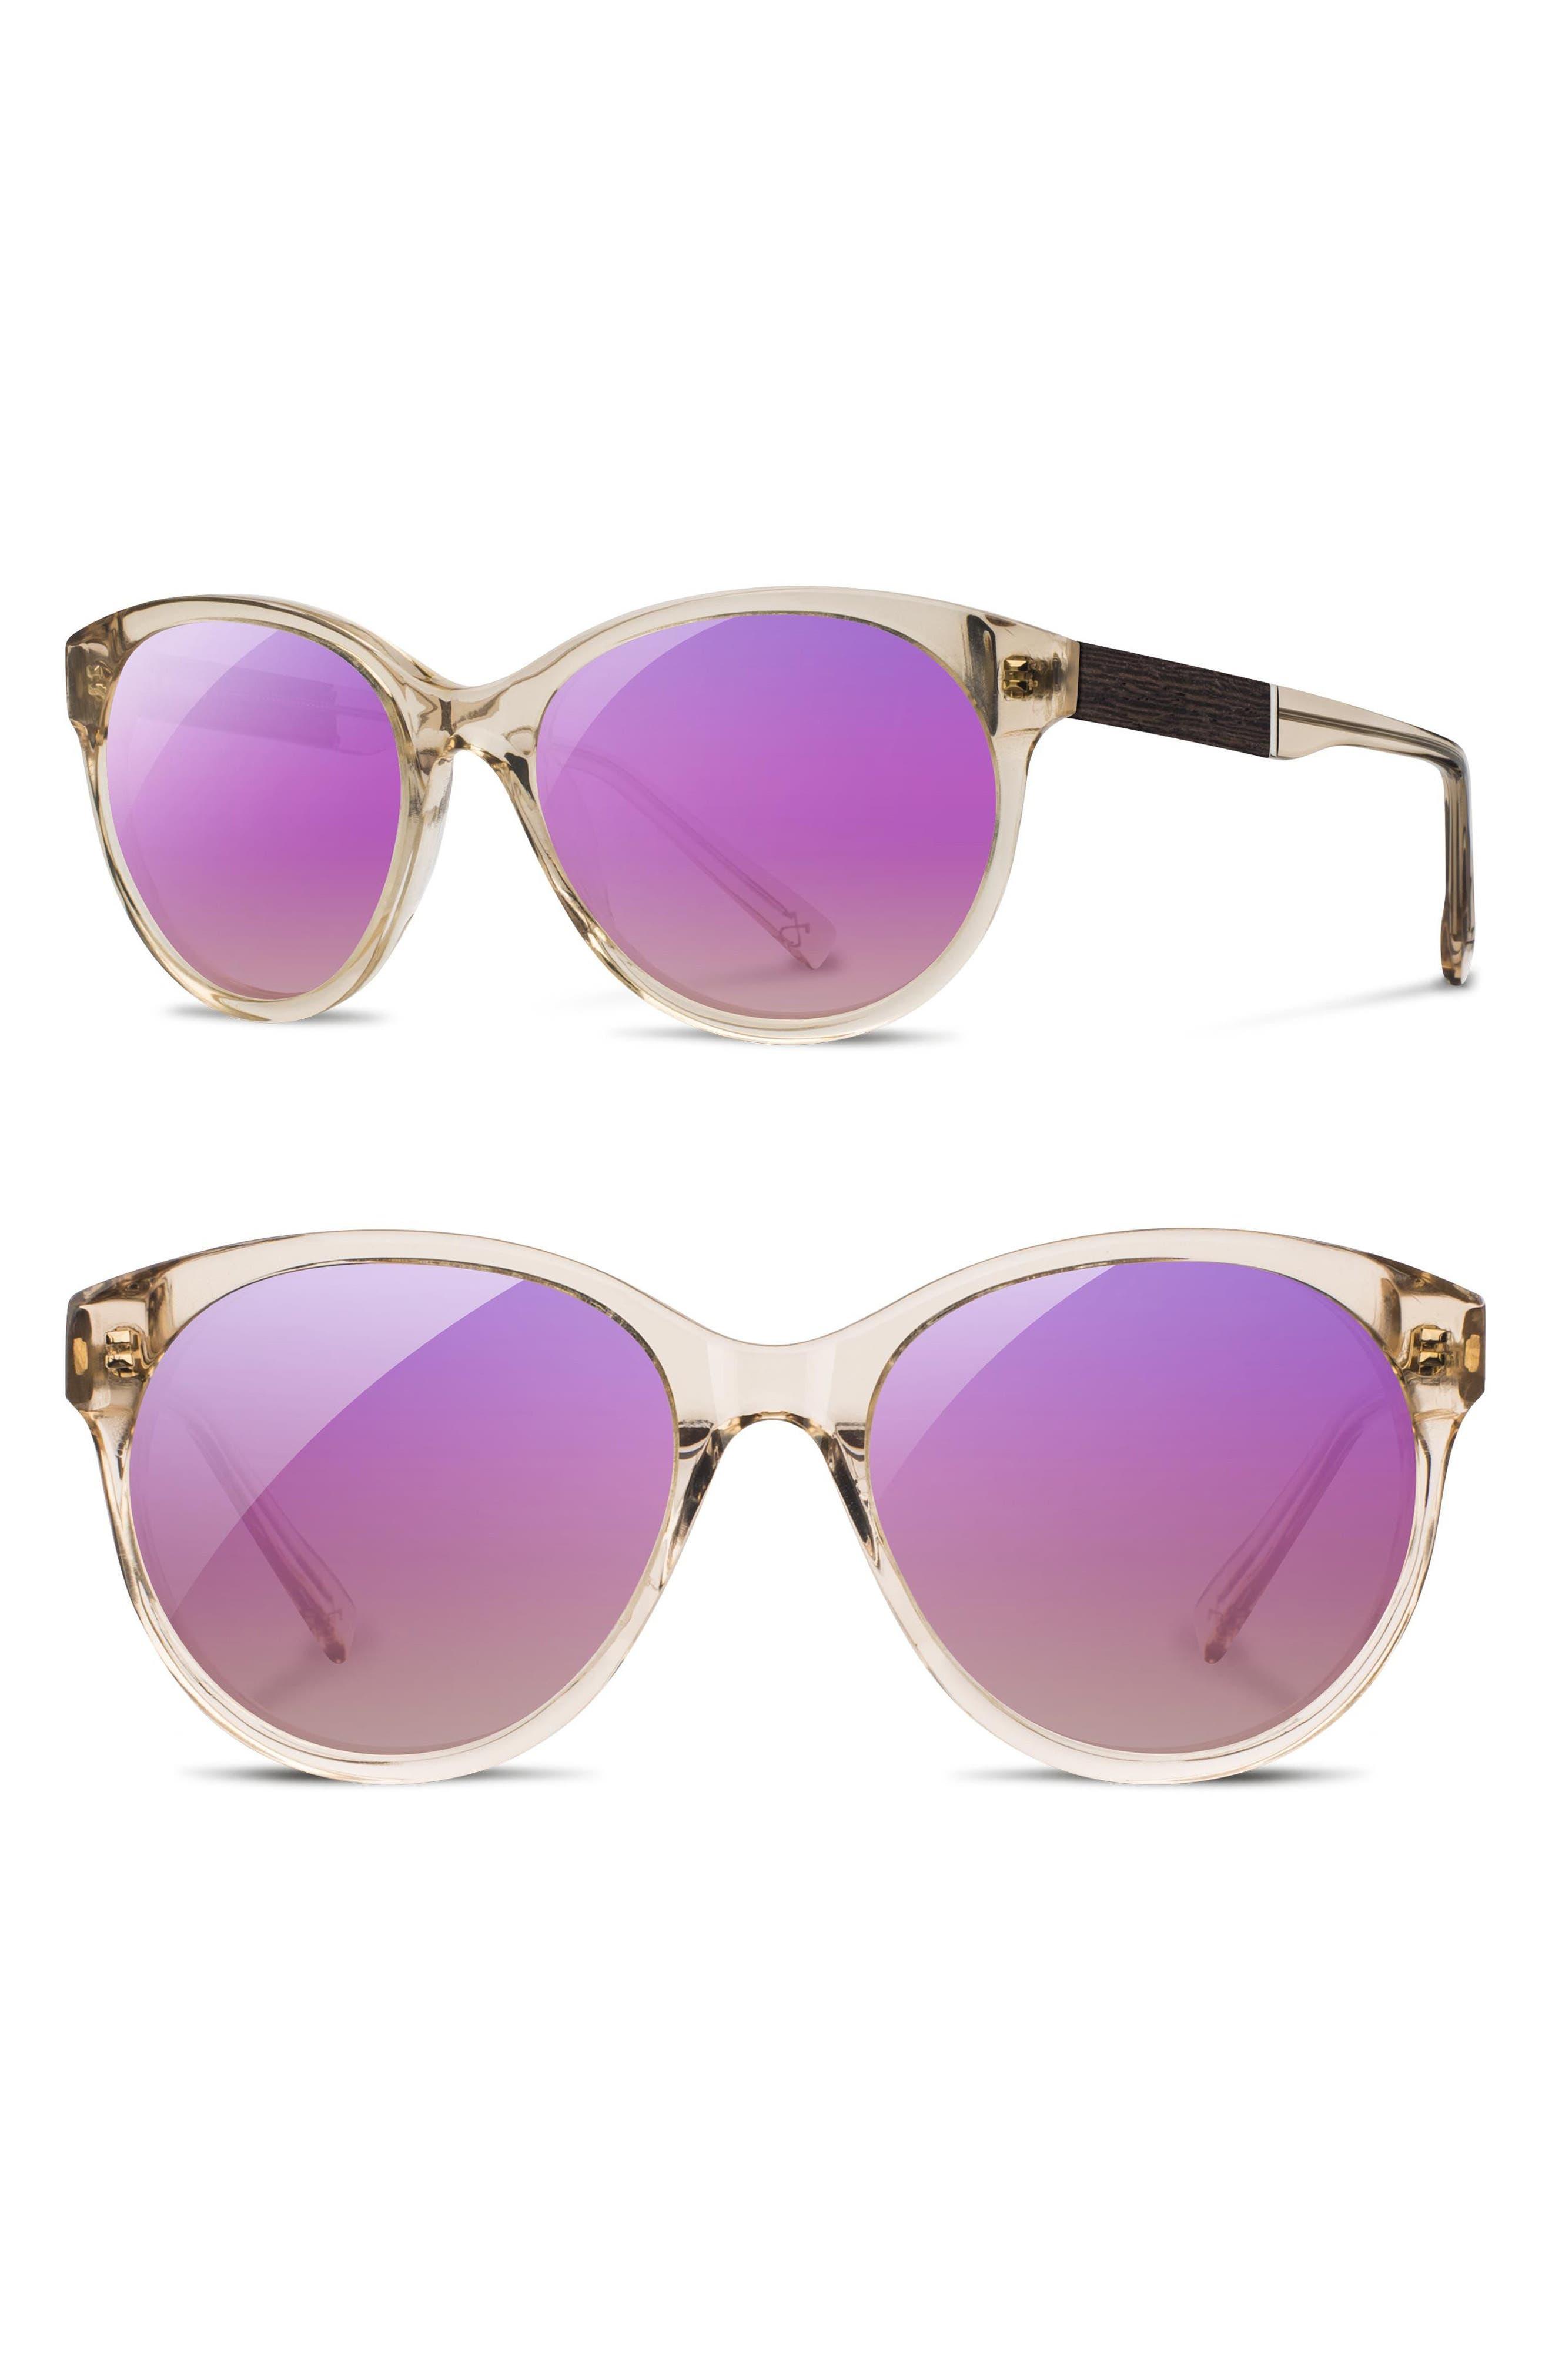 Madison Acetate Polarized Sunglasses,                         Main,                         color, Champagne/ Ebony/ Rose Polar